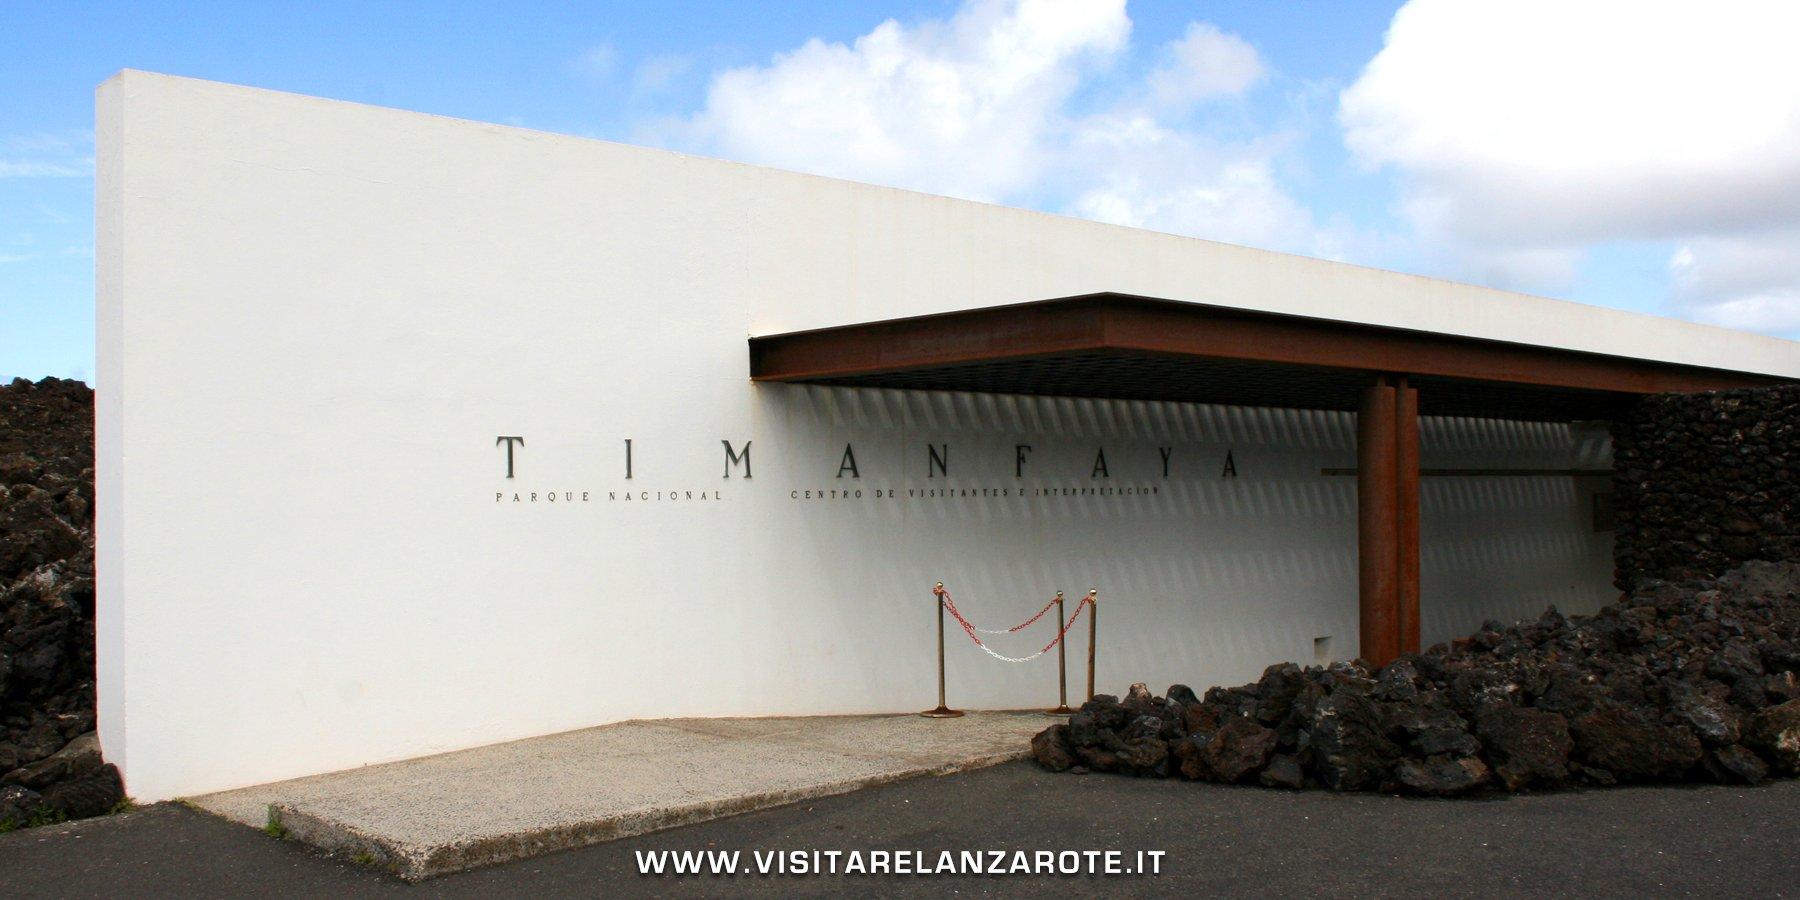 Centro de Visitantes e Interpretación Lanzarote